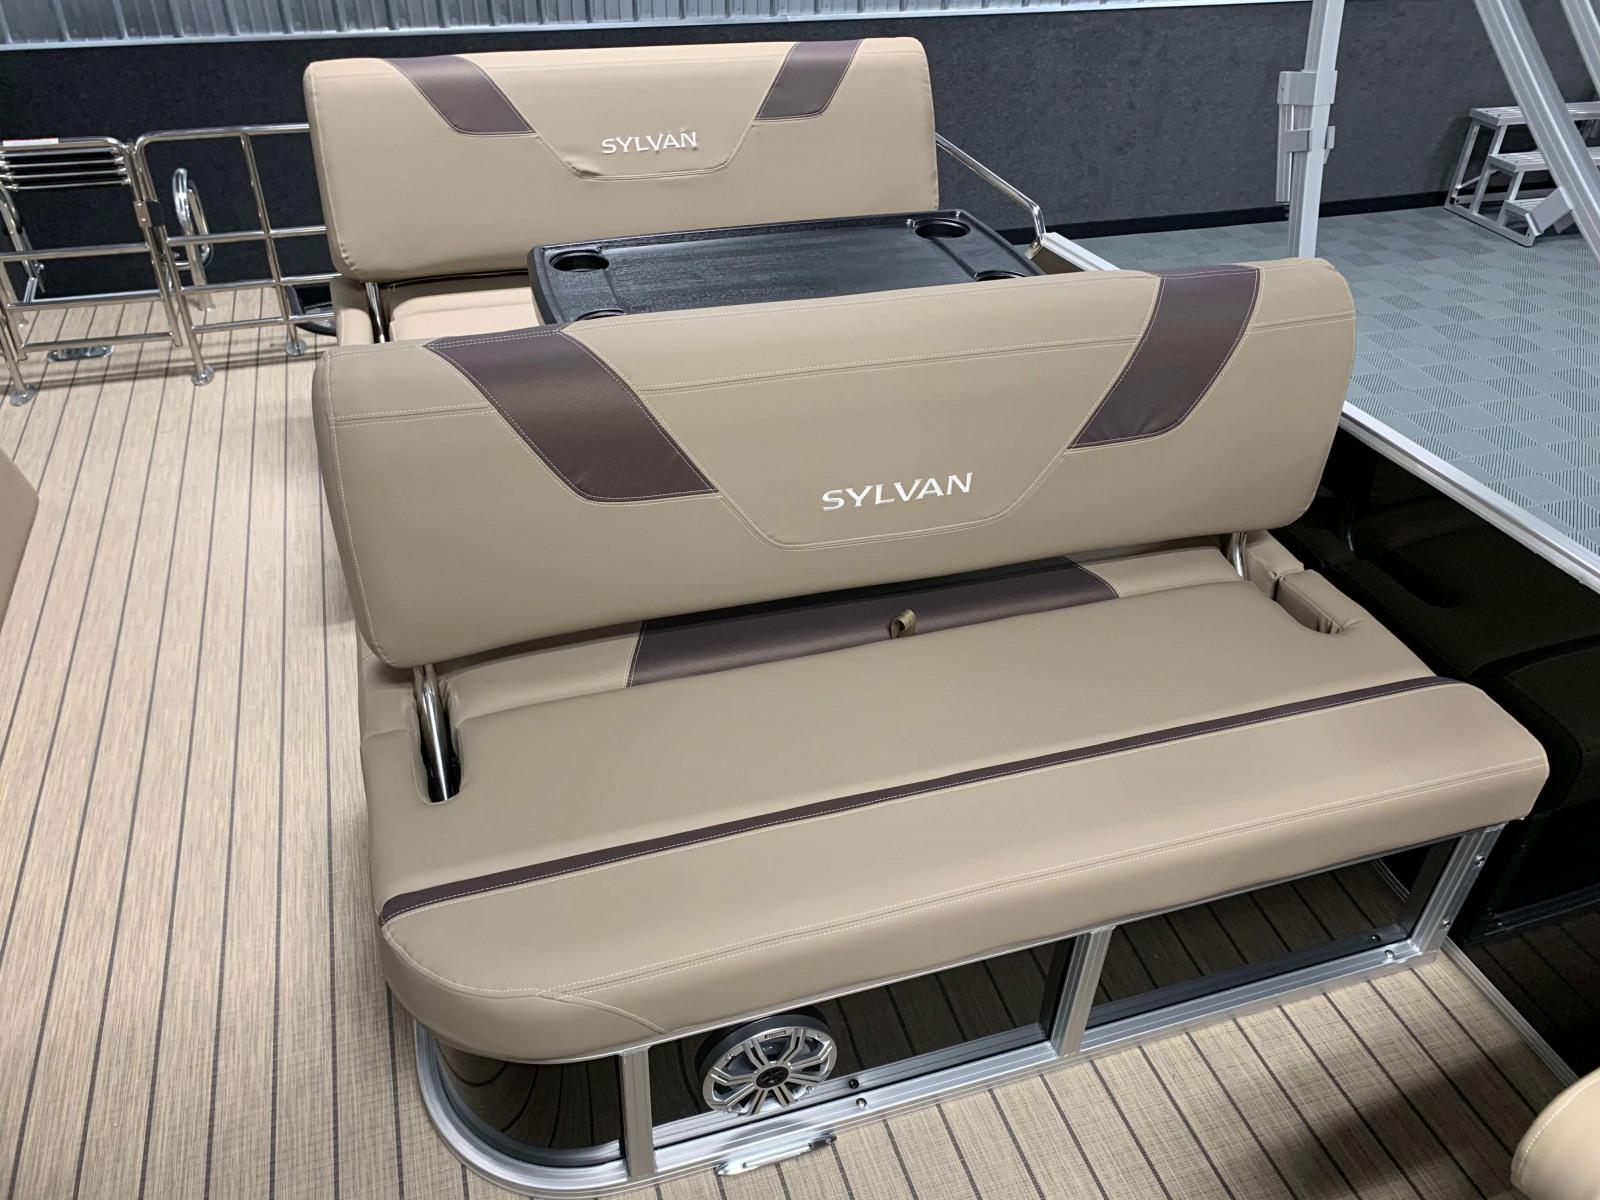 Swing Back Seating of the 2021 Sylvan L3 DLZ Pontoon Boat